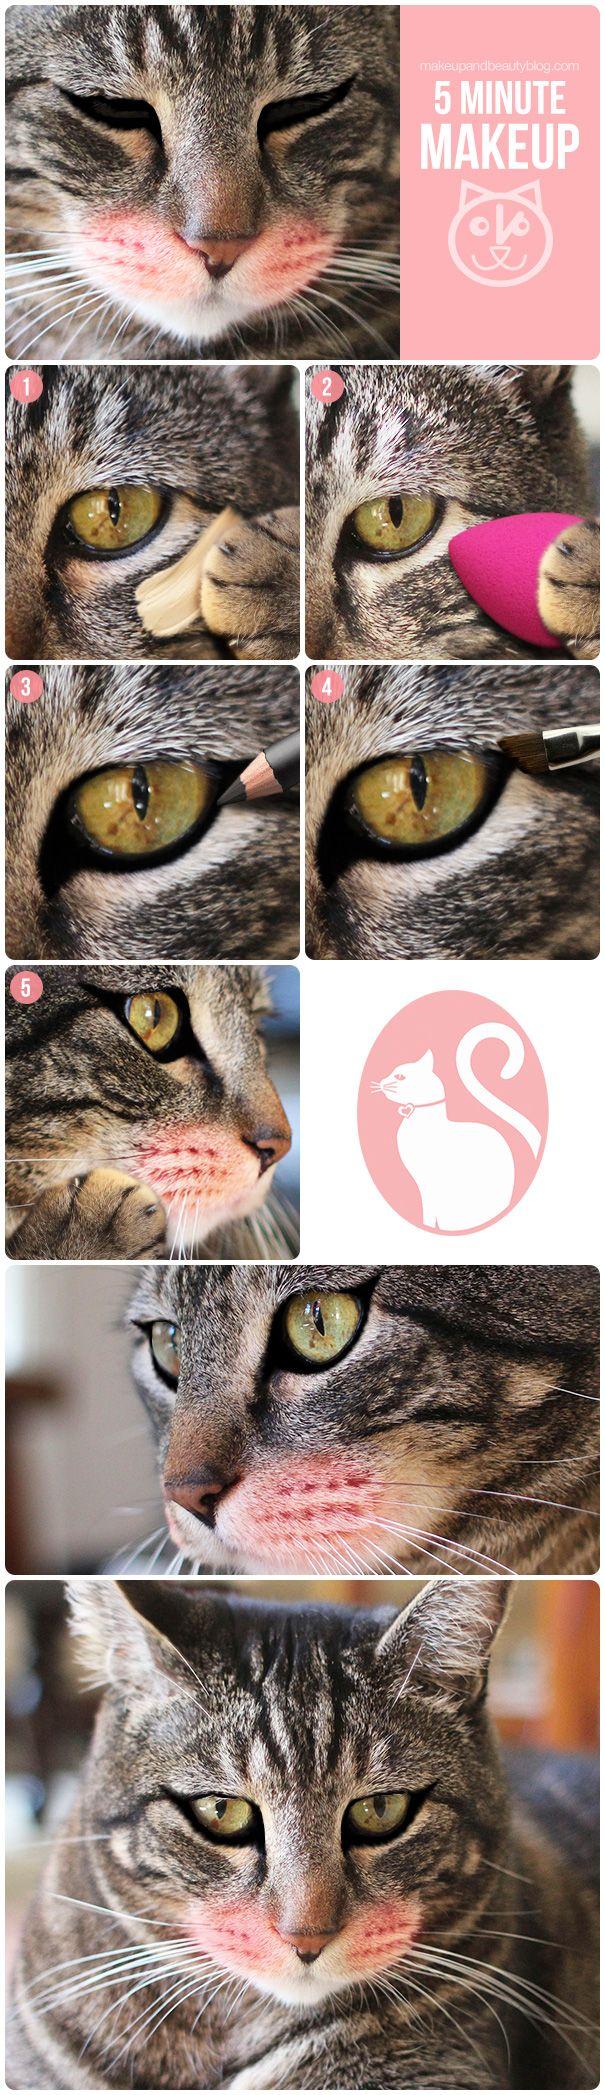 Sundays With Tabs the Cat, Makeup and Beauty Blog Mascot, Vol. 307 http://www.makeupandbeautyblog.com/just-for-fun/cat-eye-five-minute-makeup-tutorial/ #MakeupCafe